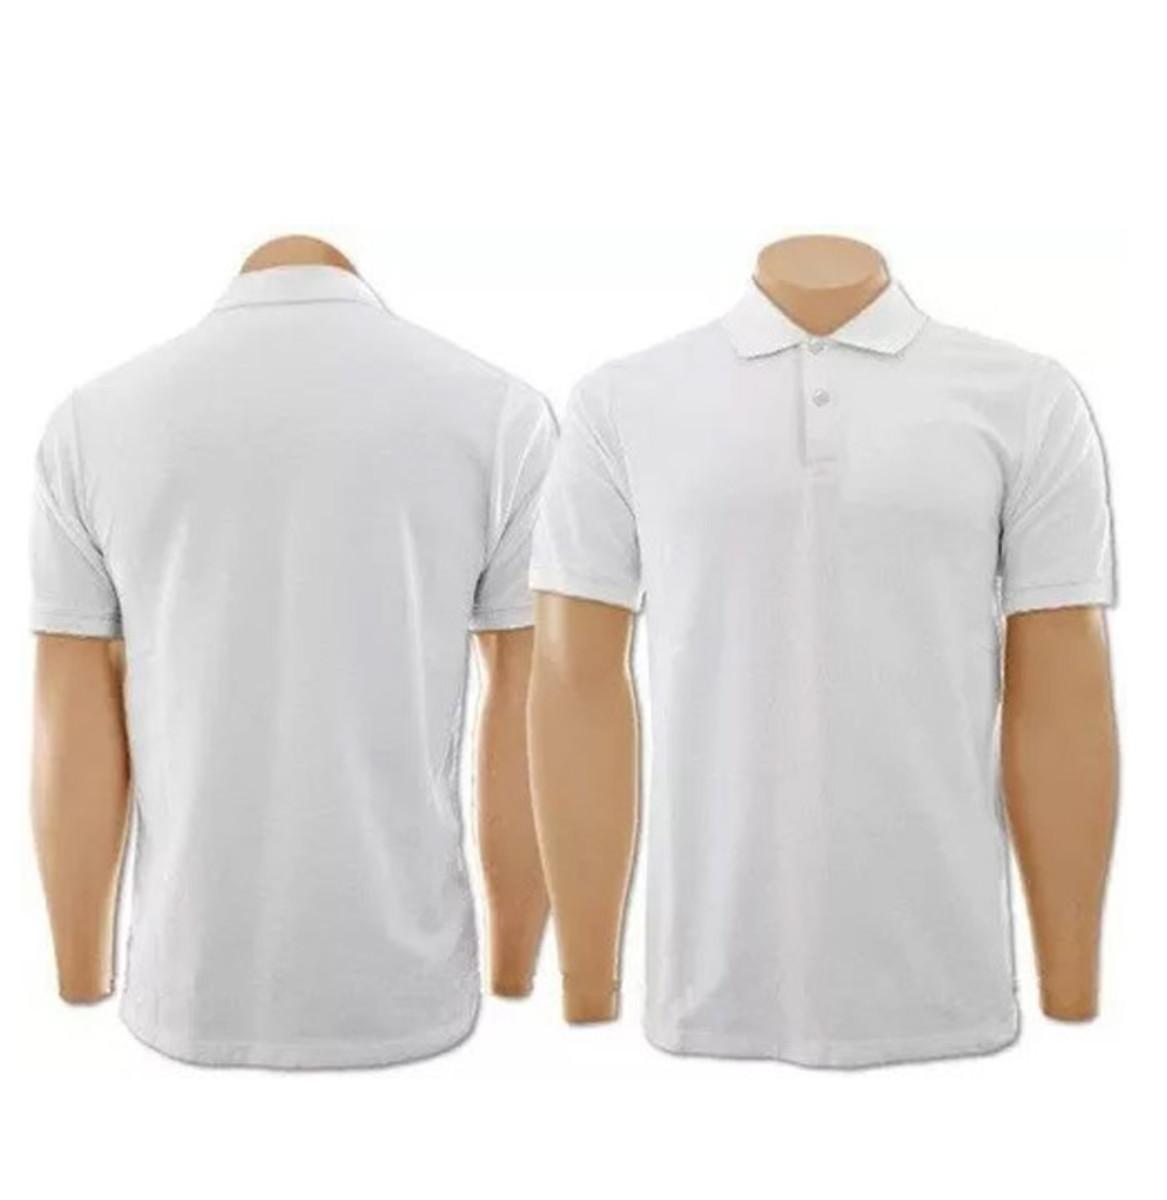 71096e1fa2 Kit com 5 Camisetas Gola Polo Branca Masculina no Elo7